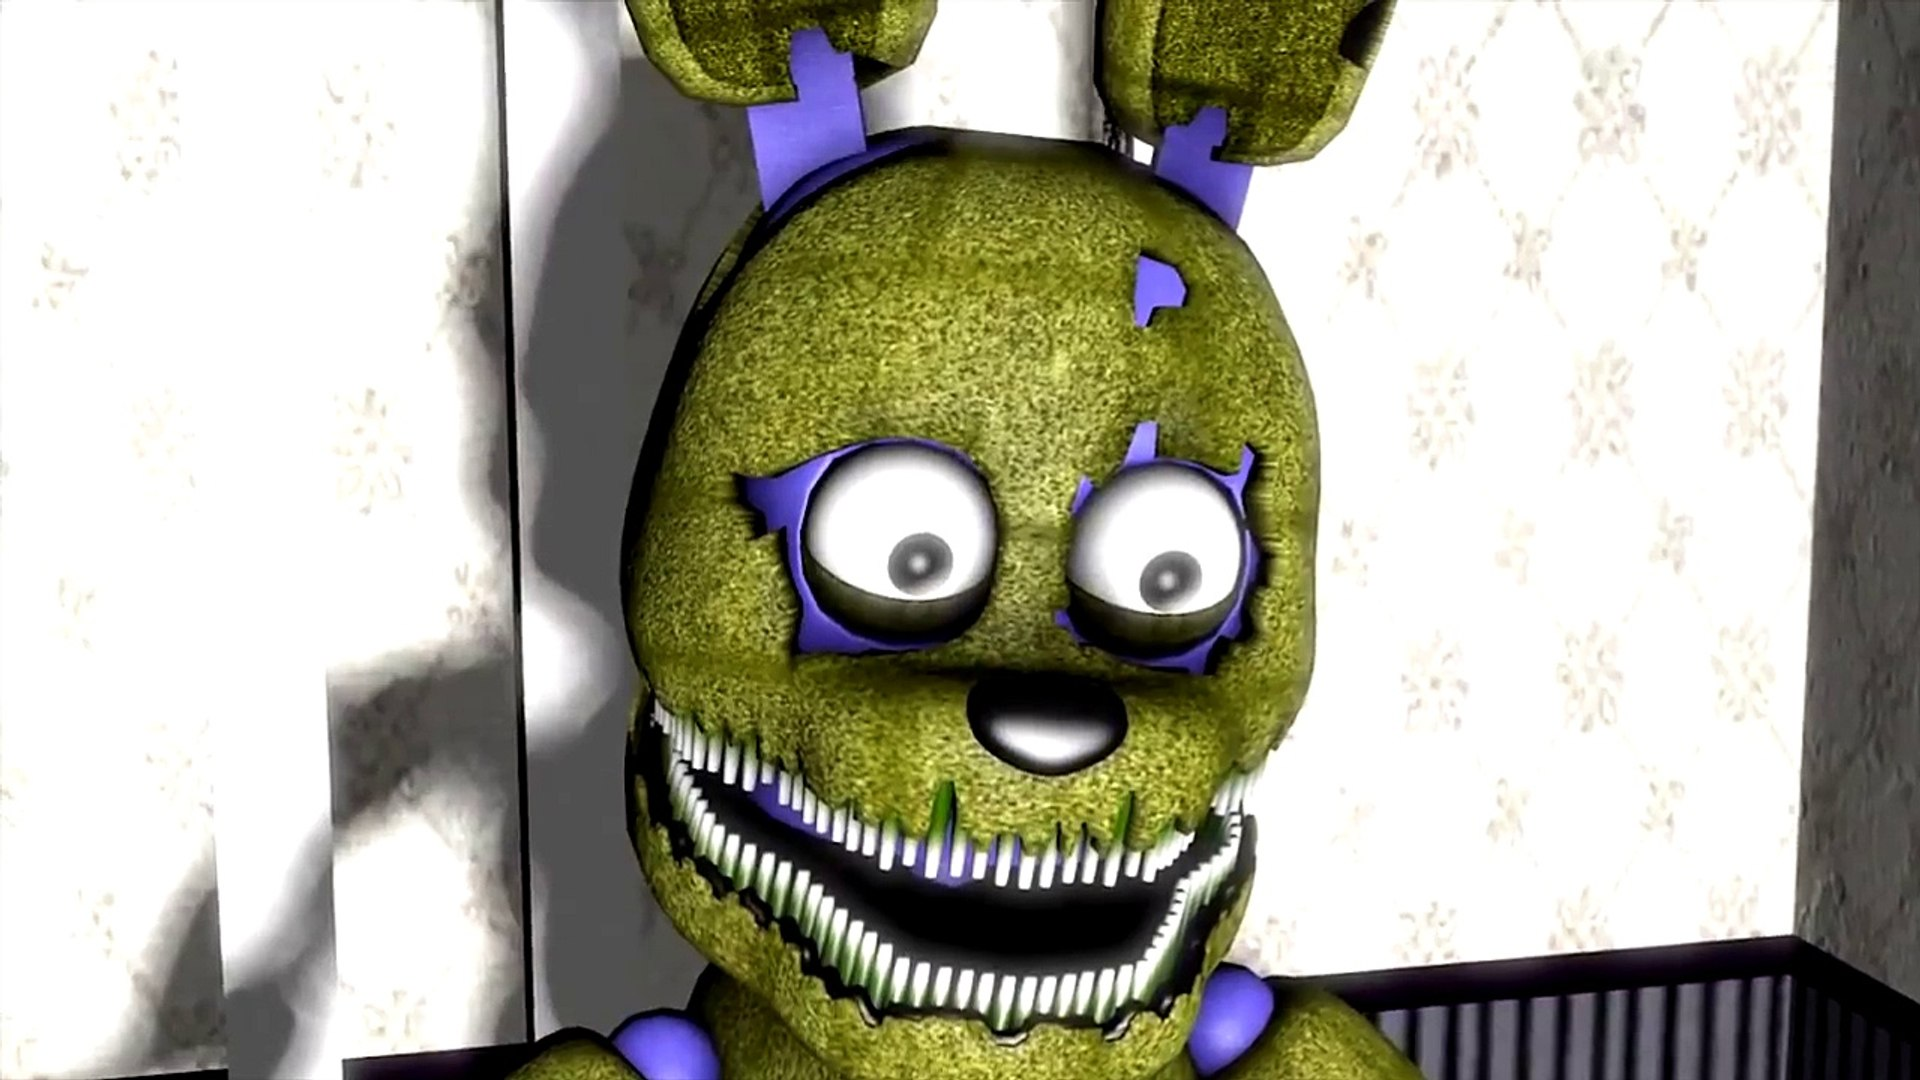 [SFM FNAF Funny Compilation] Top 5 FNAF Song & FNAF Animations | Five Nights at Freddys Animatio